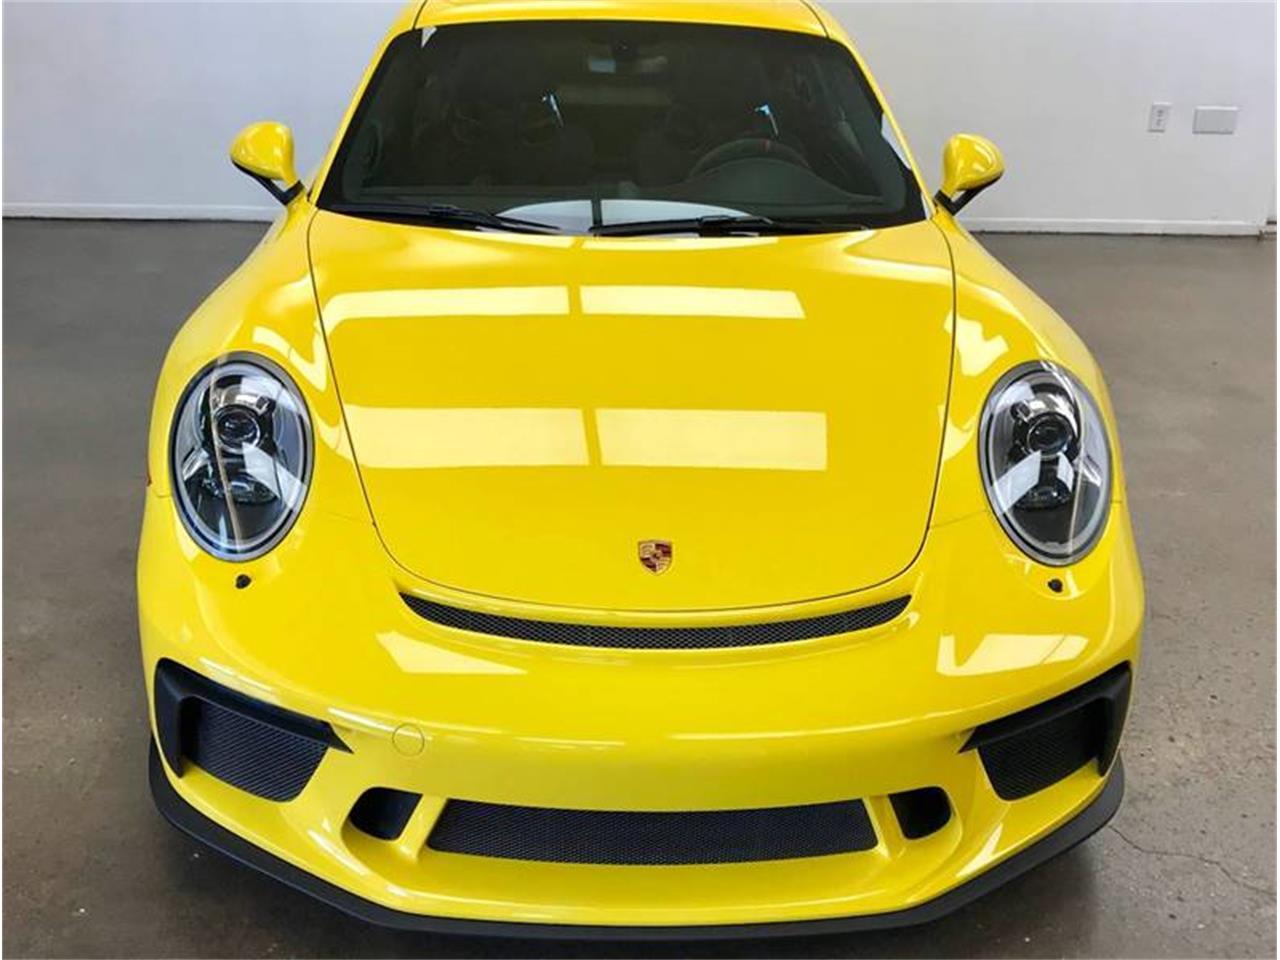 2018 Porsche 911 (CC-1193826) for sale in Allison Park, Pennsylvania